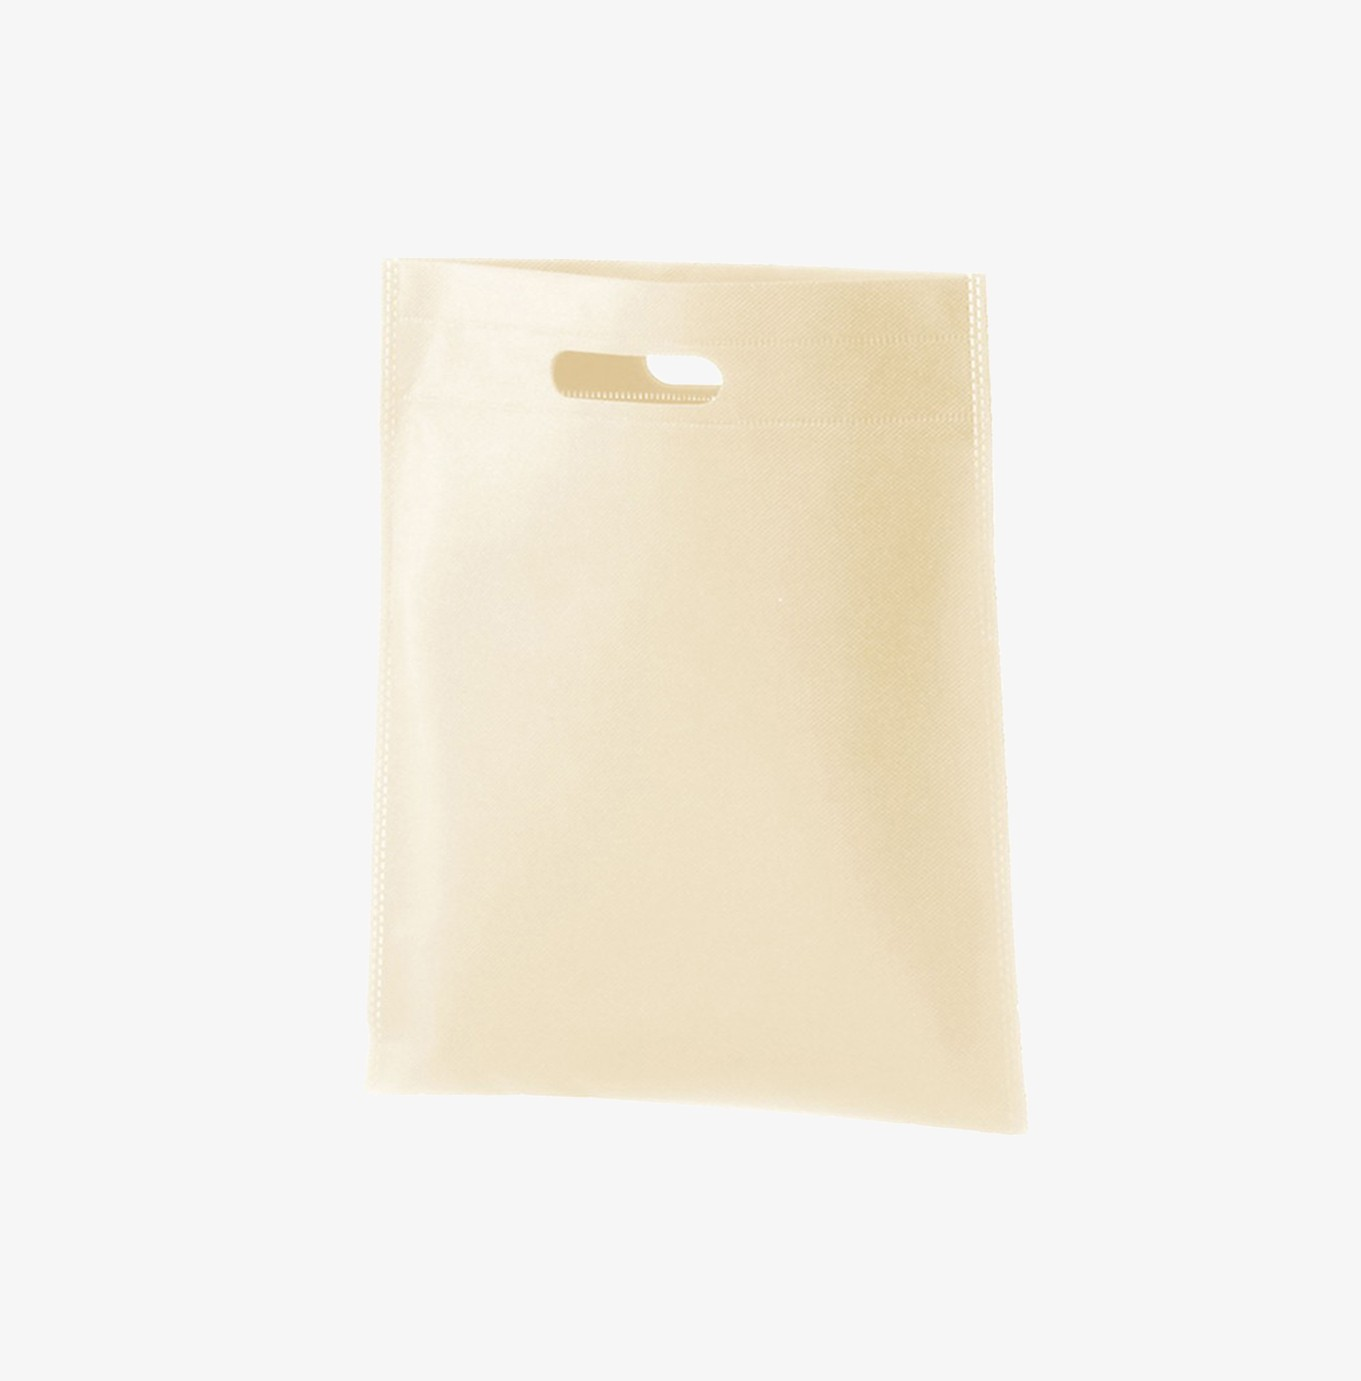 PKD40x55MB 米白色平口袋 40x55cm 100个